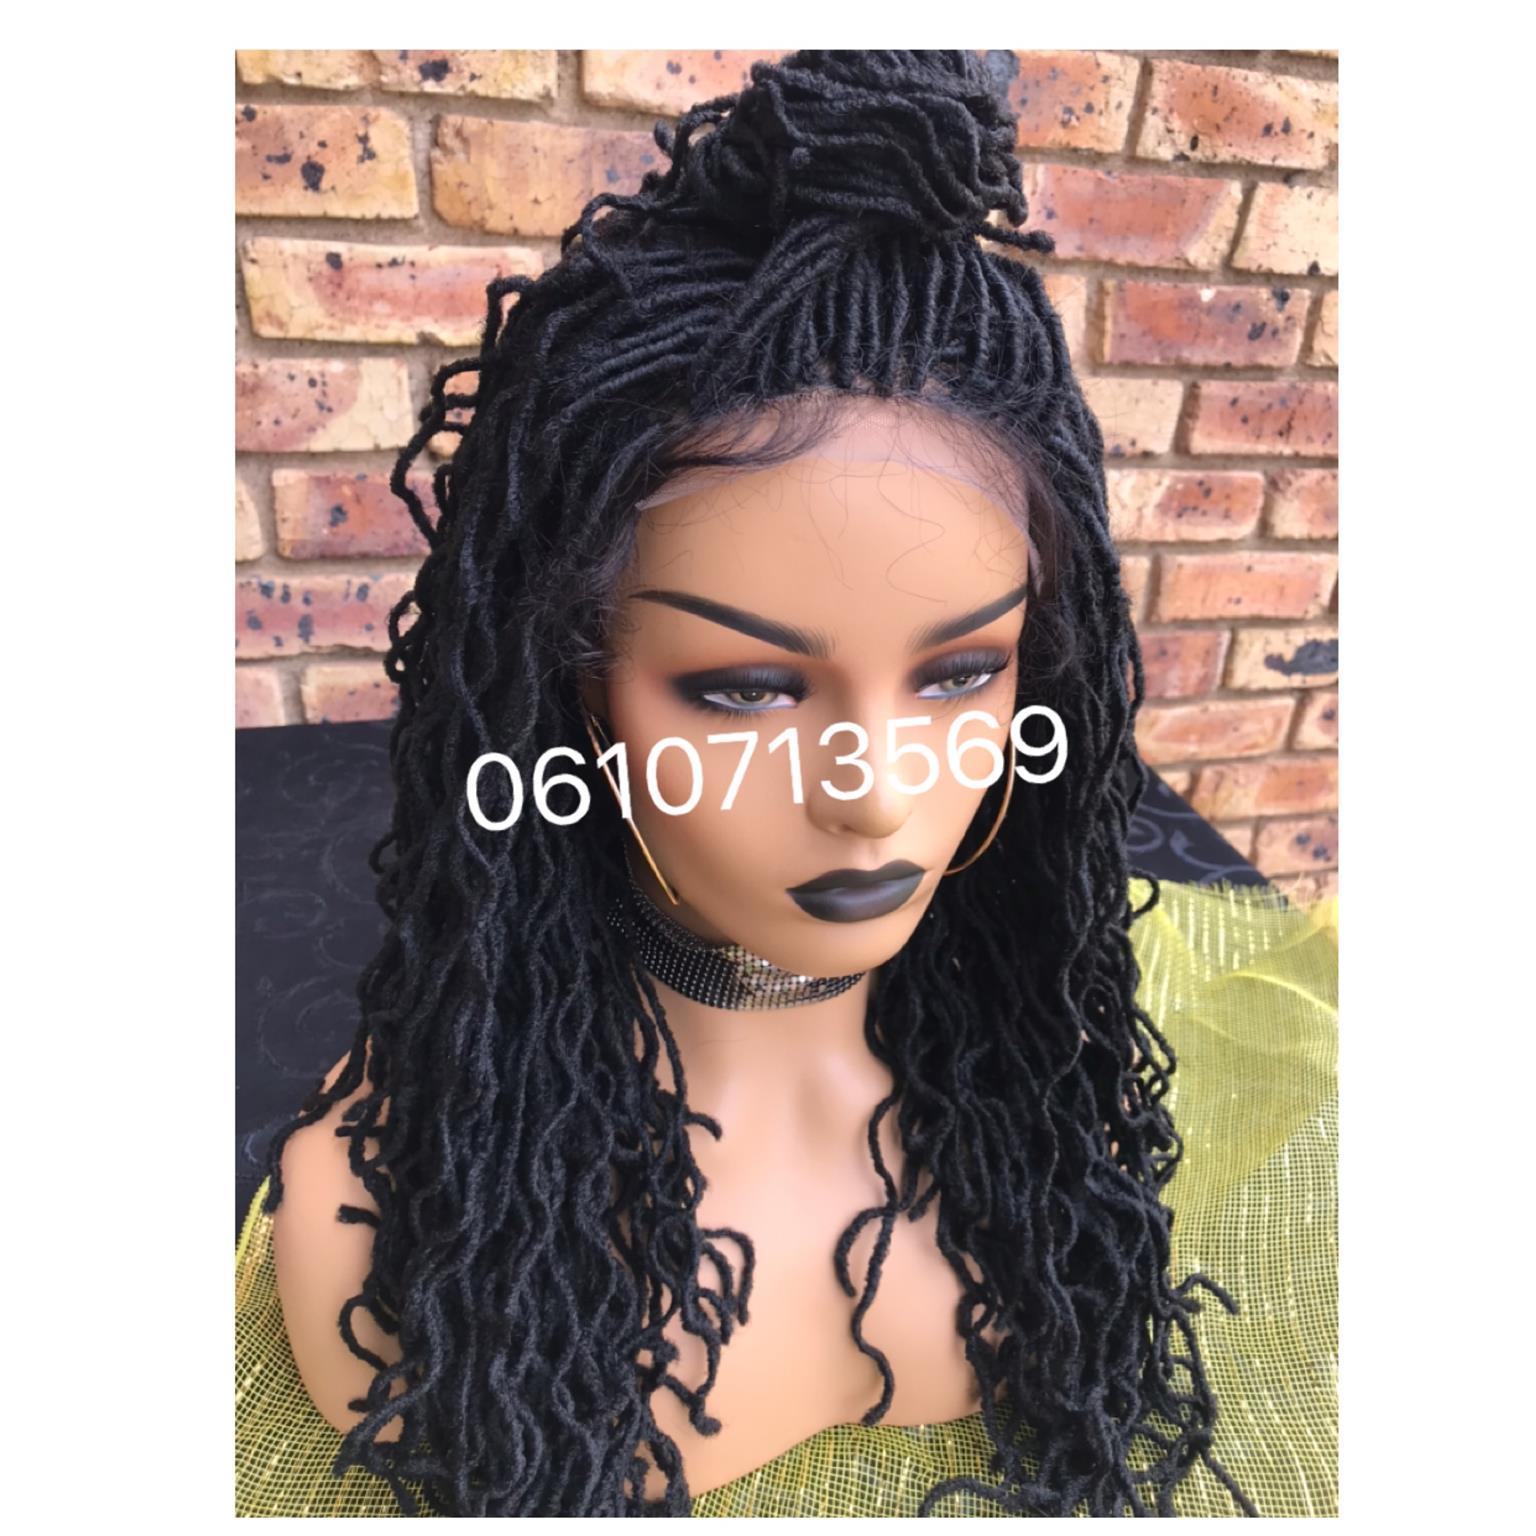 Stunning dreadlocks wig with soft baby hair